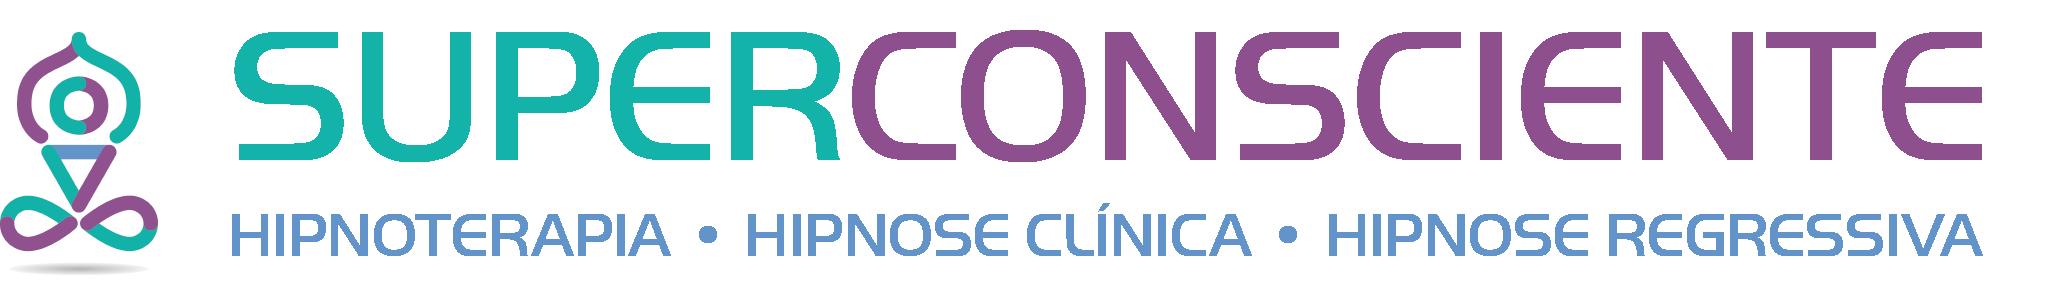 SuperConsciente Hipnoterapia Hipnose Clinica Vila-Real-Amarante-Lamego-Pedro-Bizarro